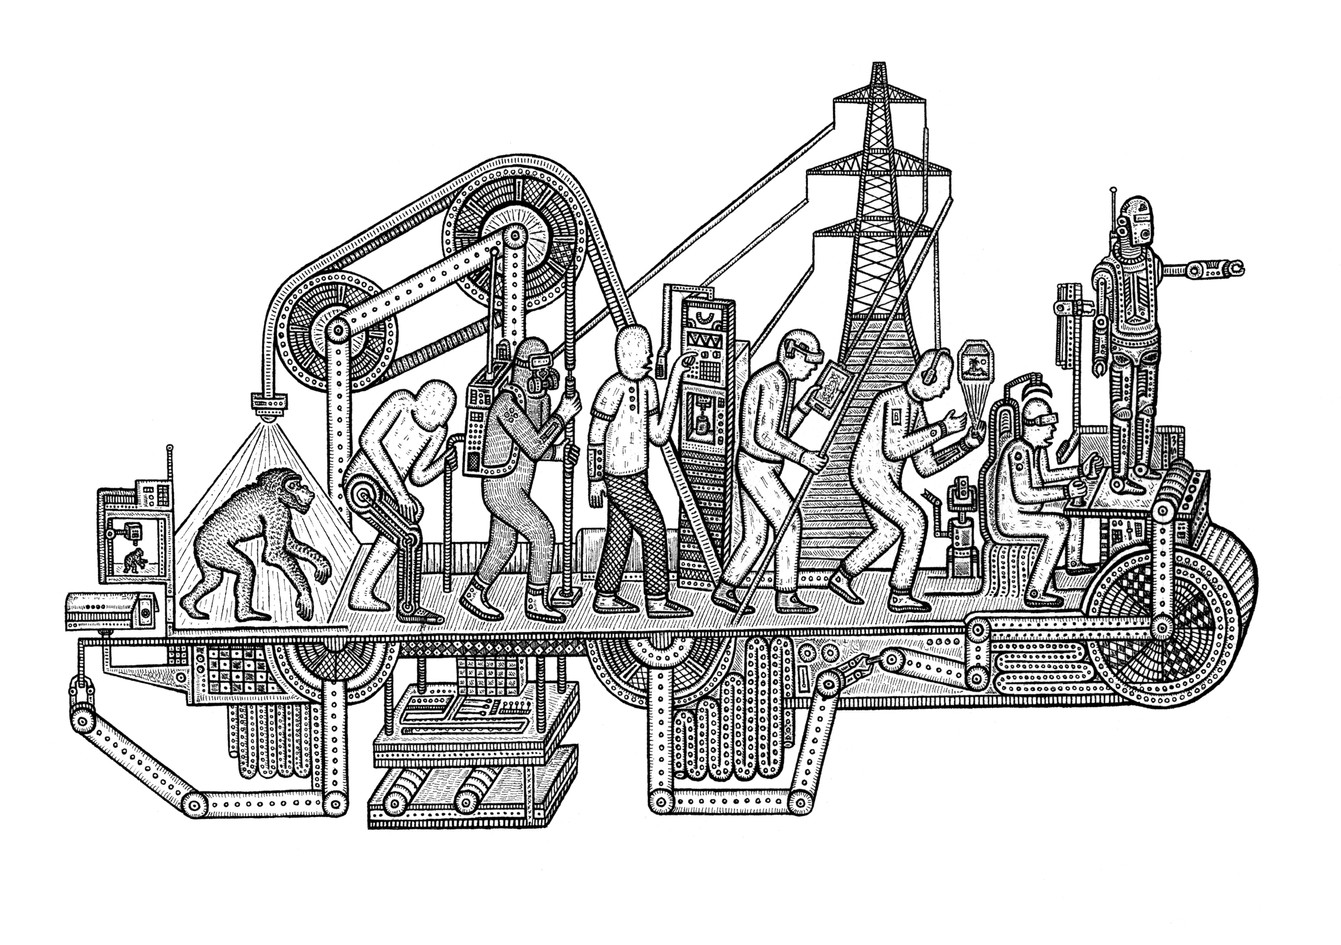 FUTURE+MACHINES+sq.jpg